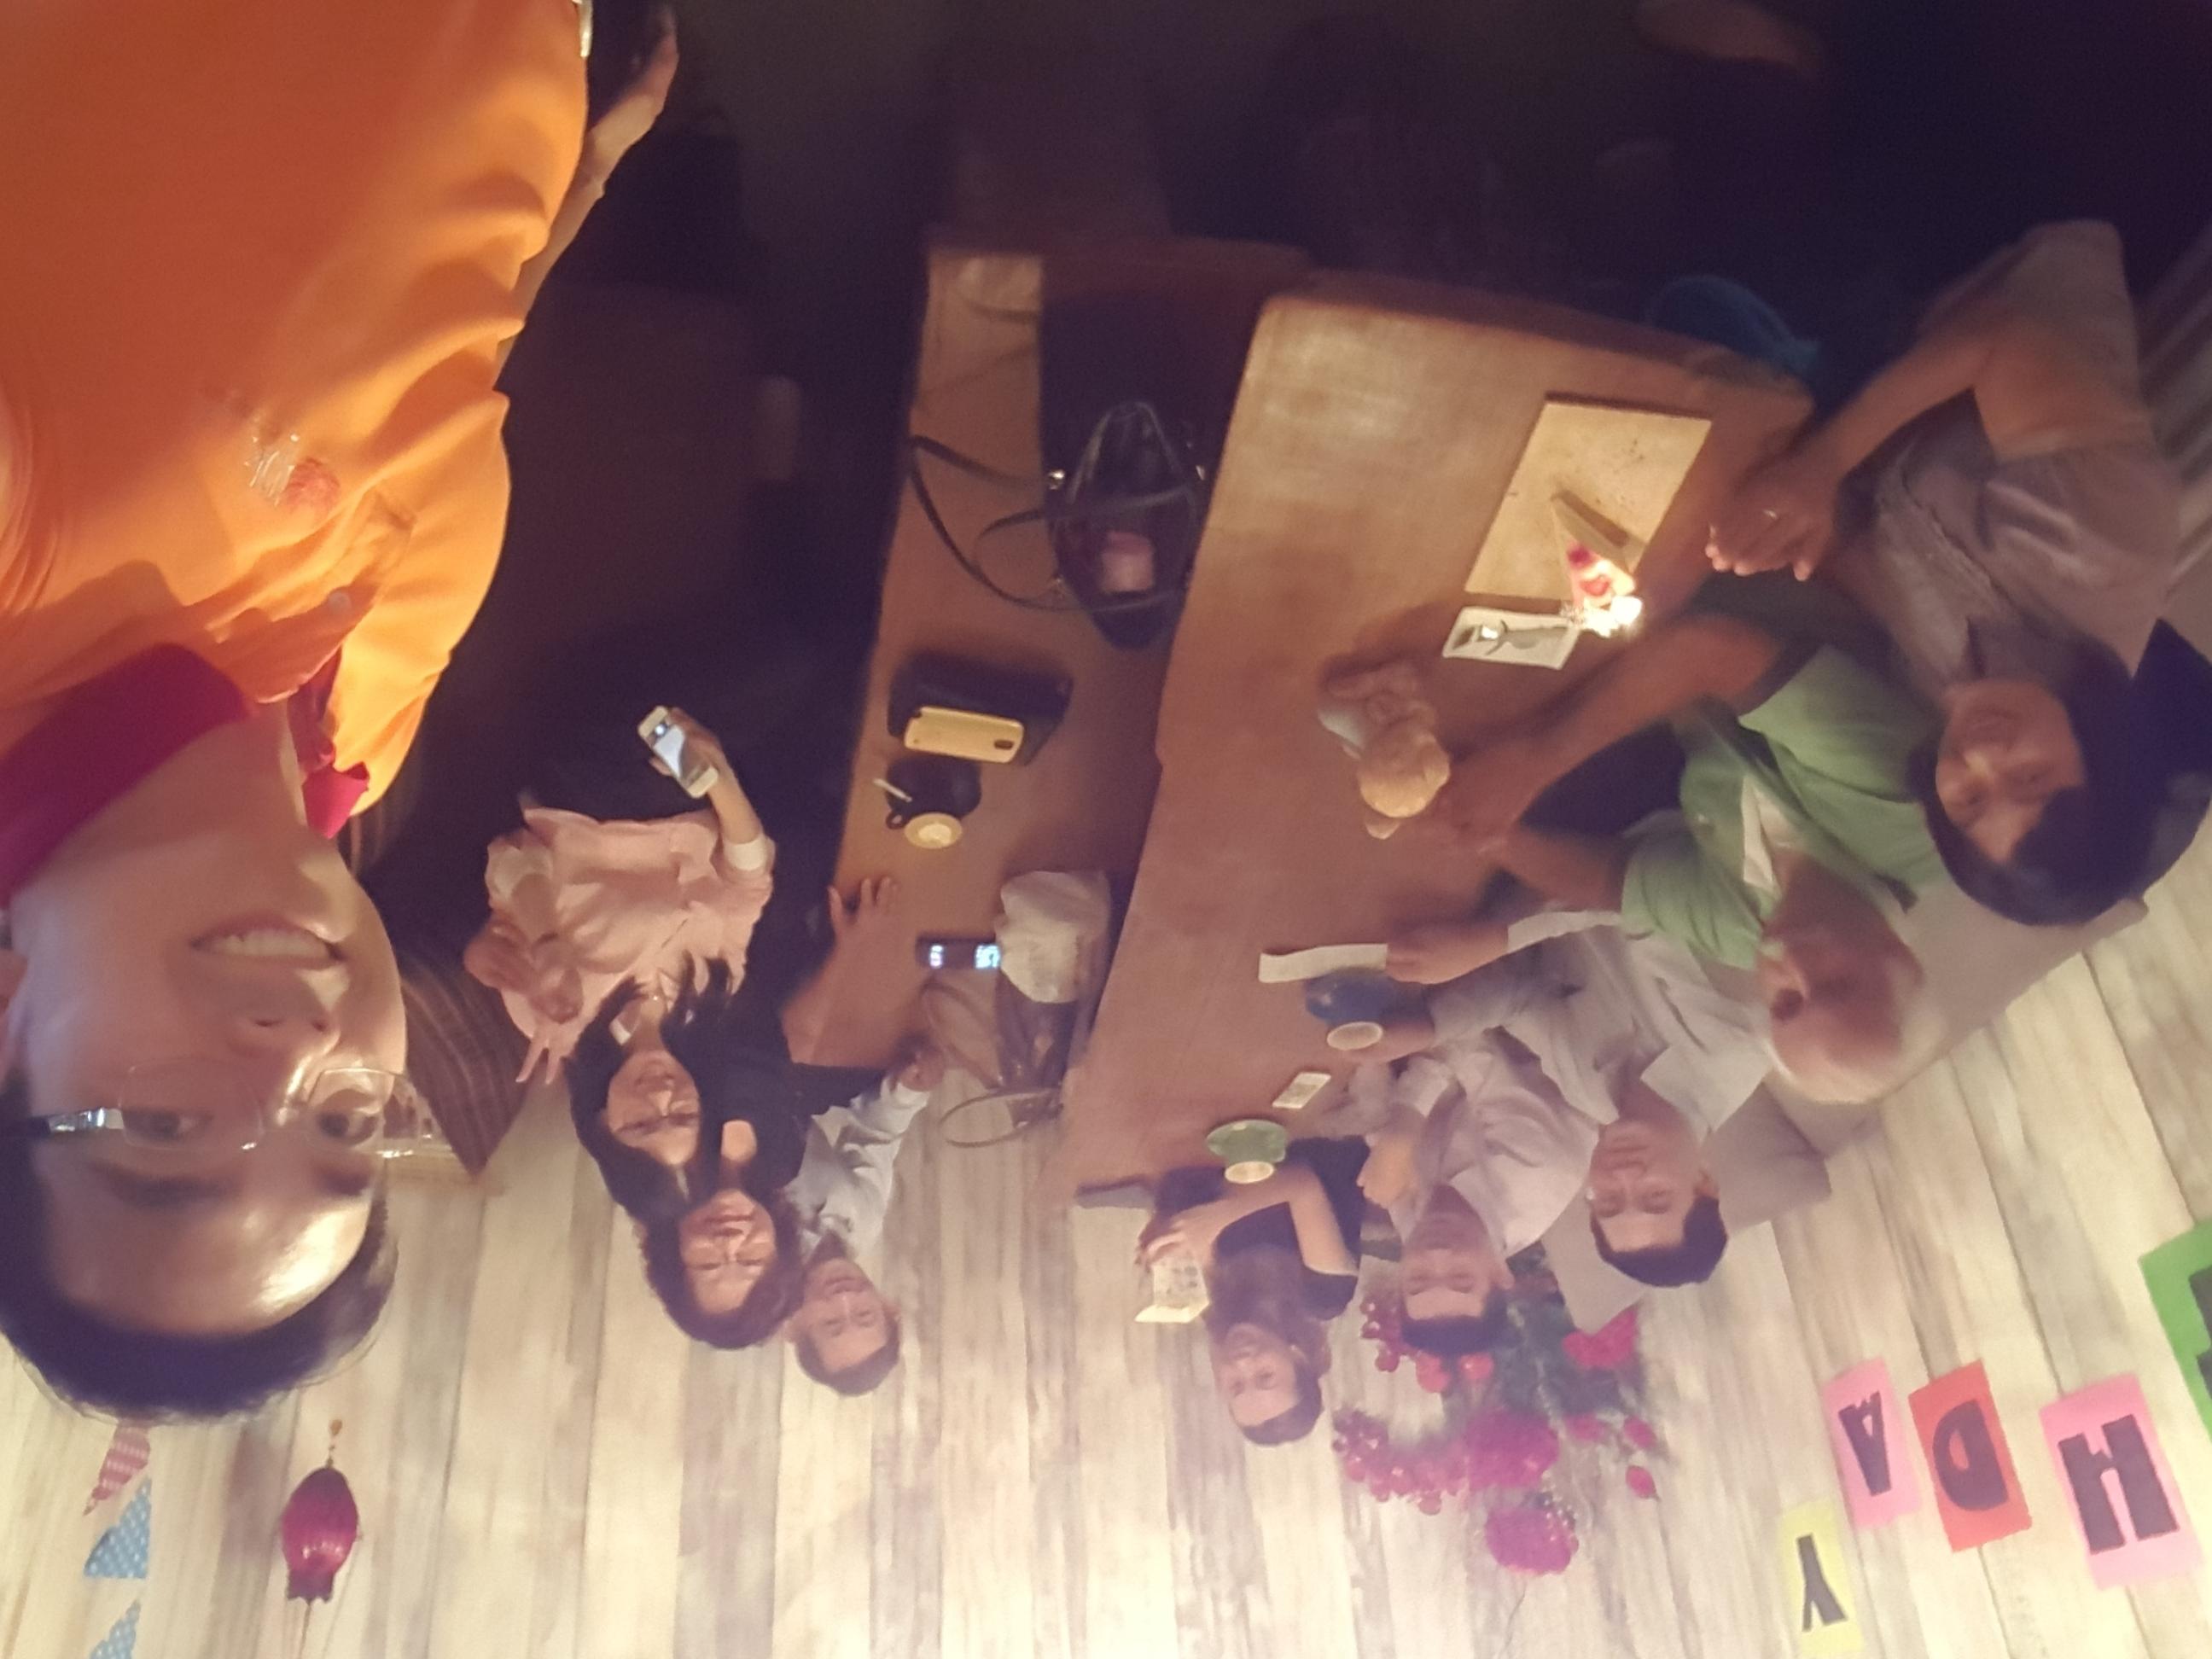 IPK COLLEGE DINNER